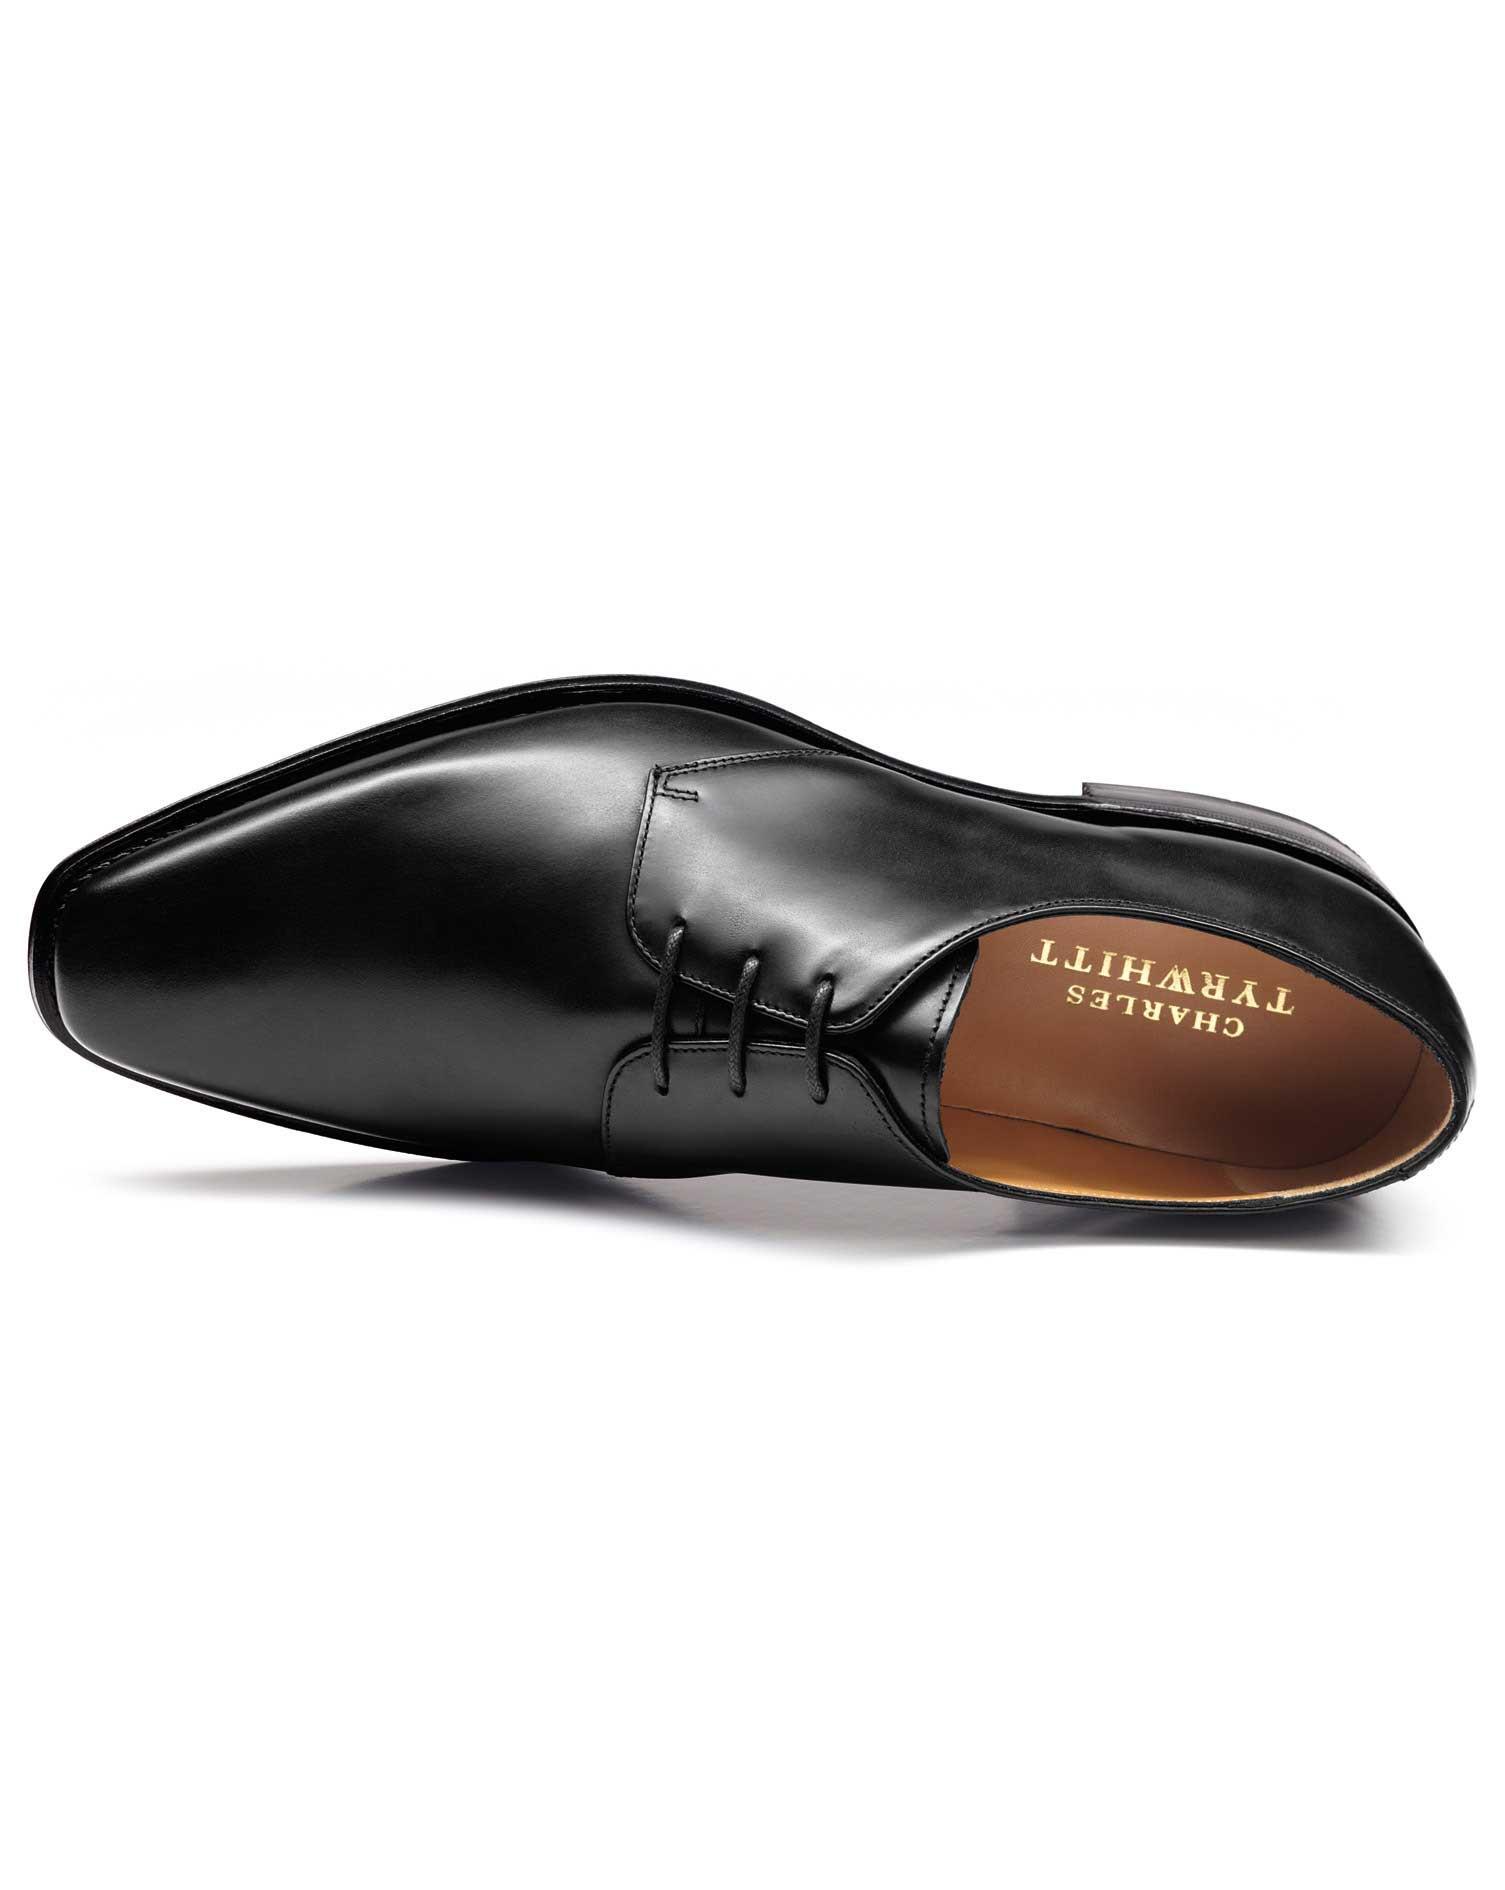 Black Soho Derby Shoes Size 10 R by Charles Tyrwhitt